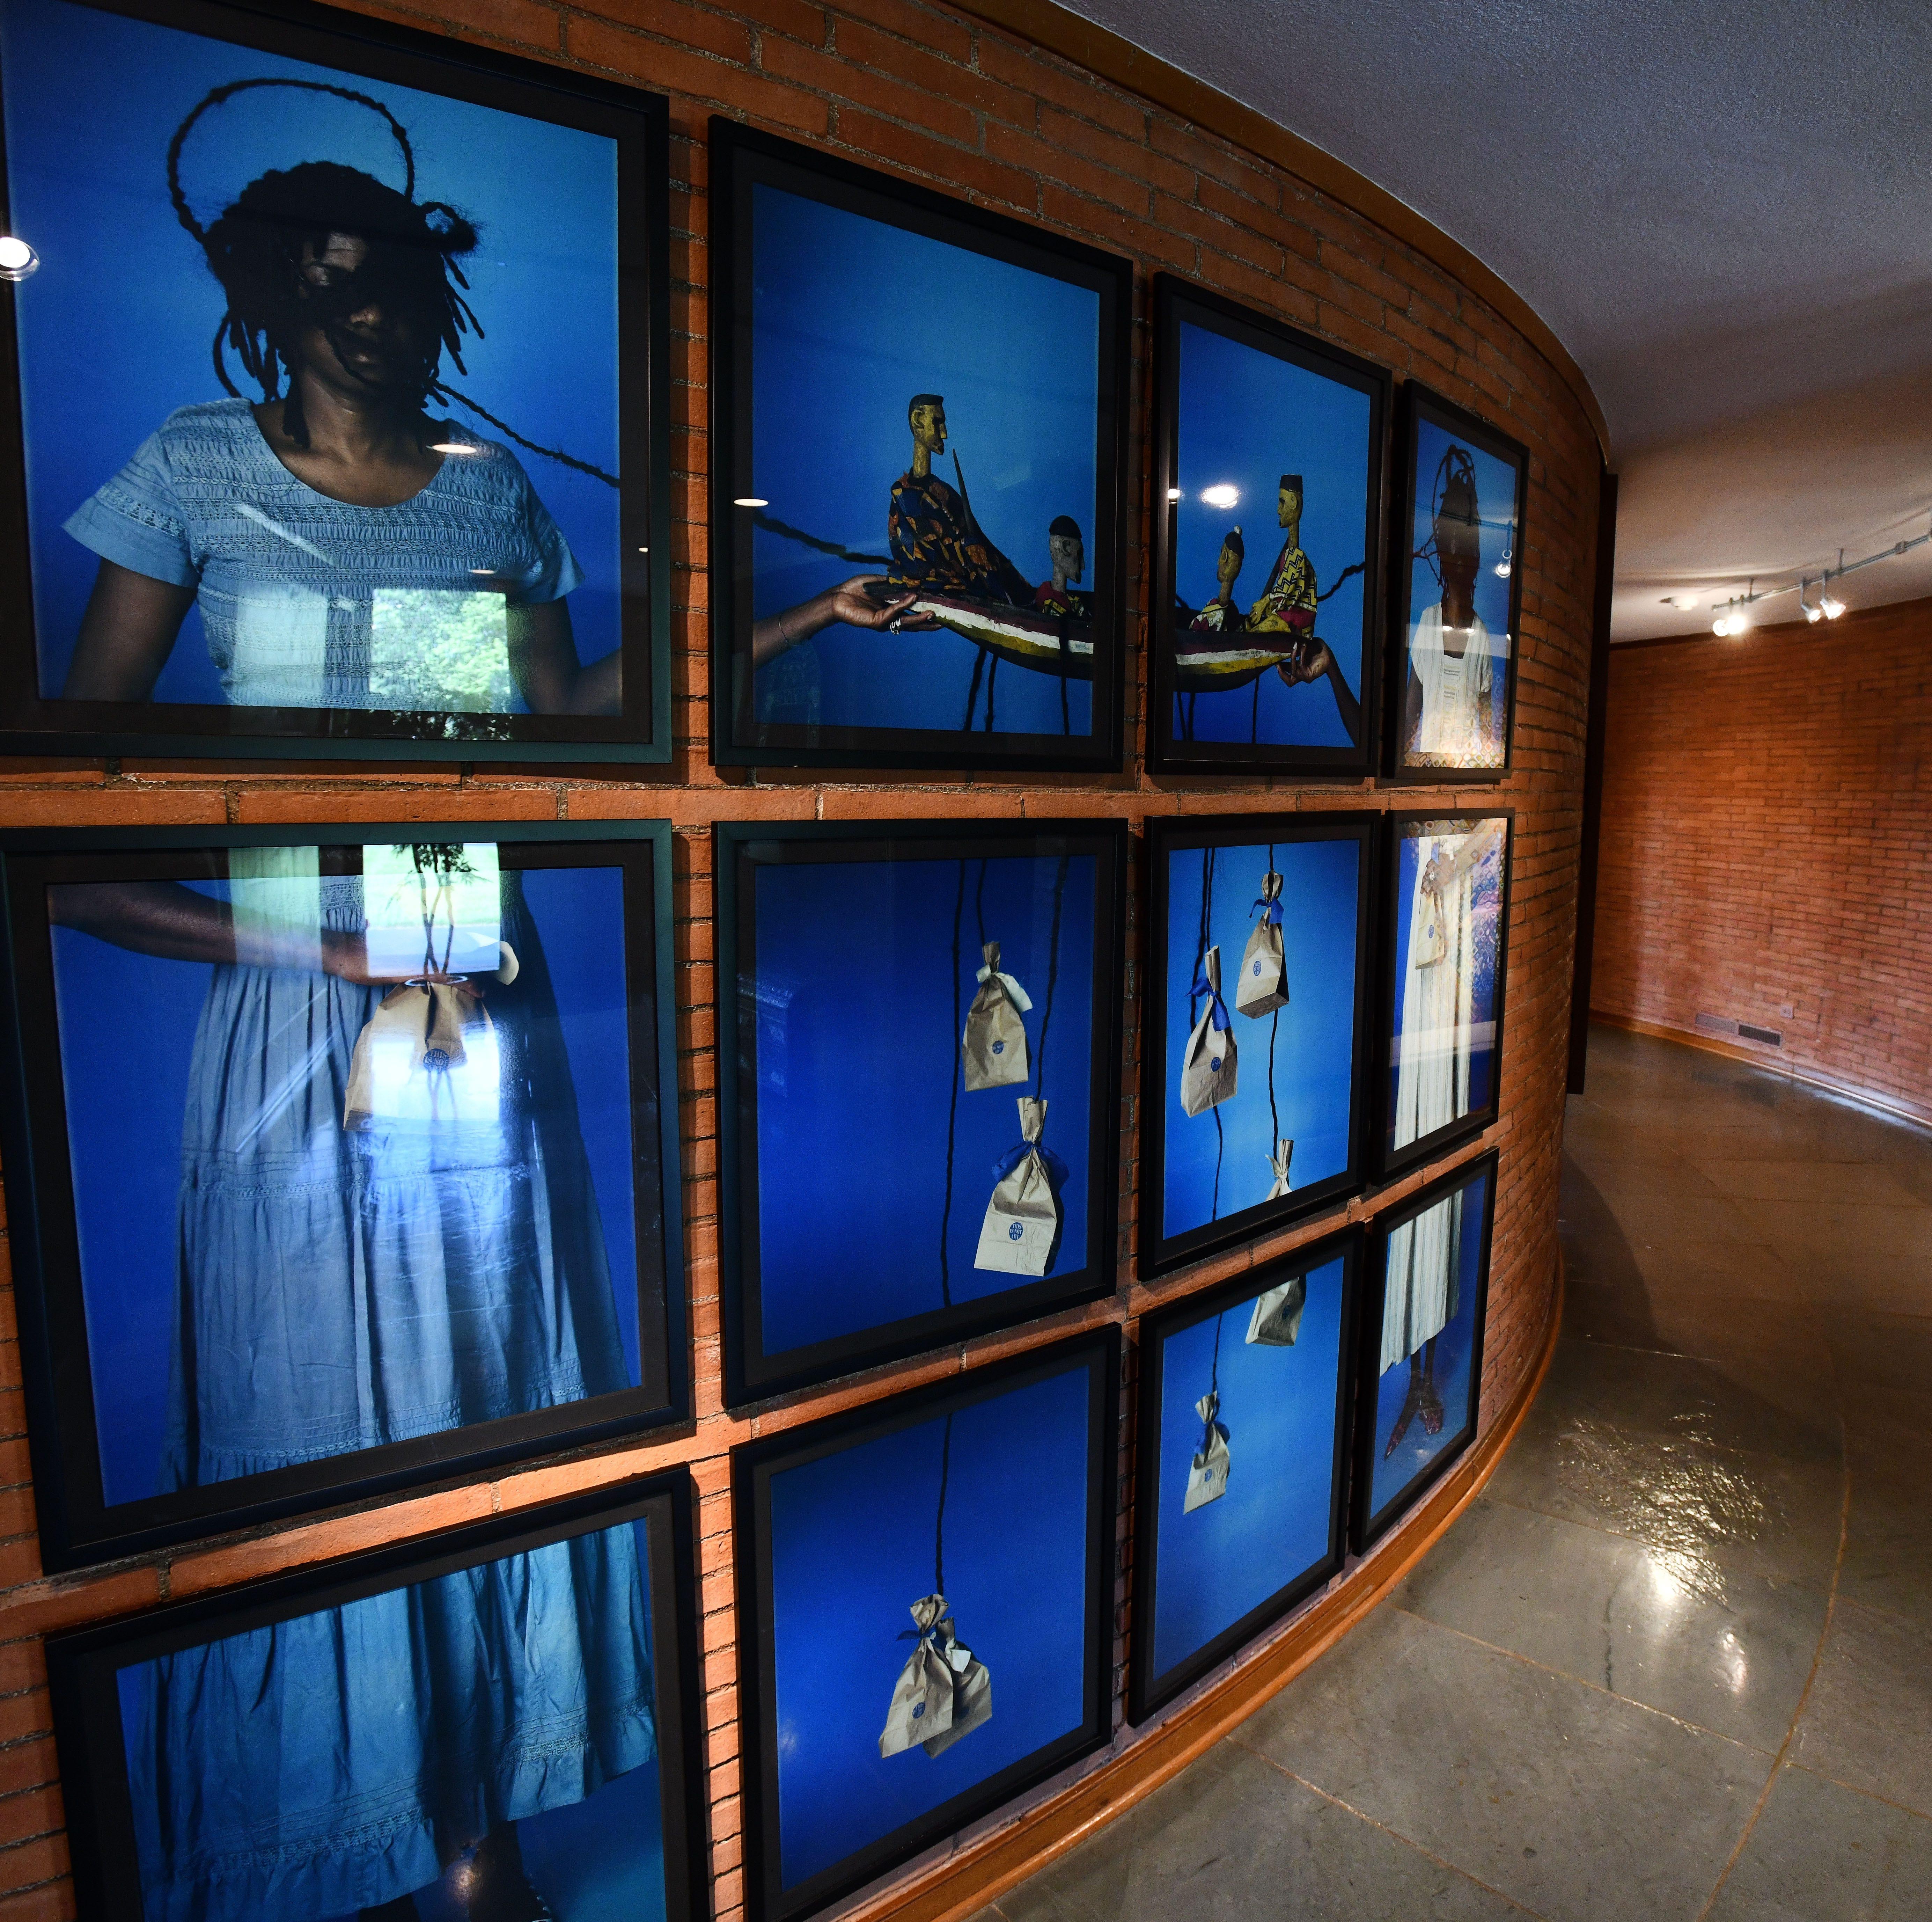 New era begins for Oakland University's new president's home, art collection